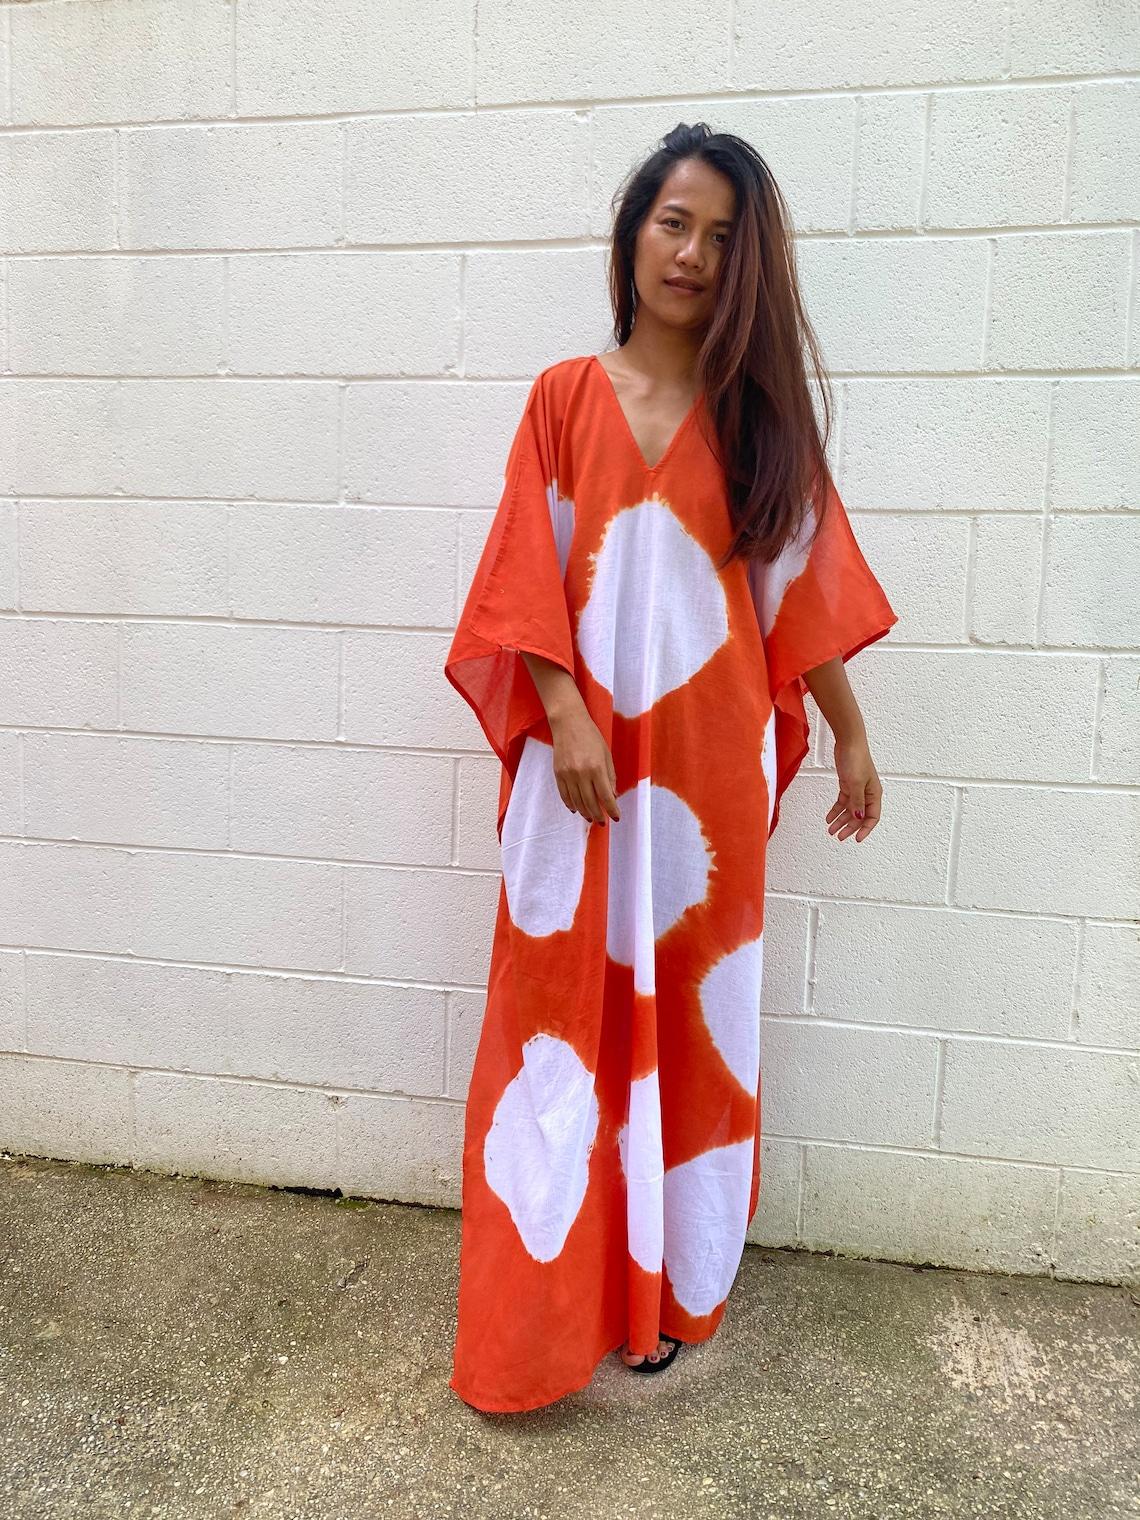 O. COTTON GAUZE KAFTAN Summer dressTie dyed Hand tie dyed